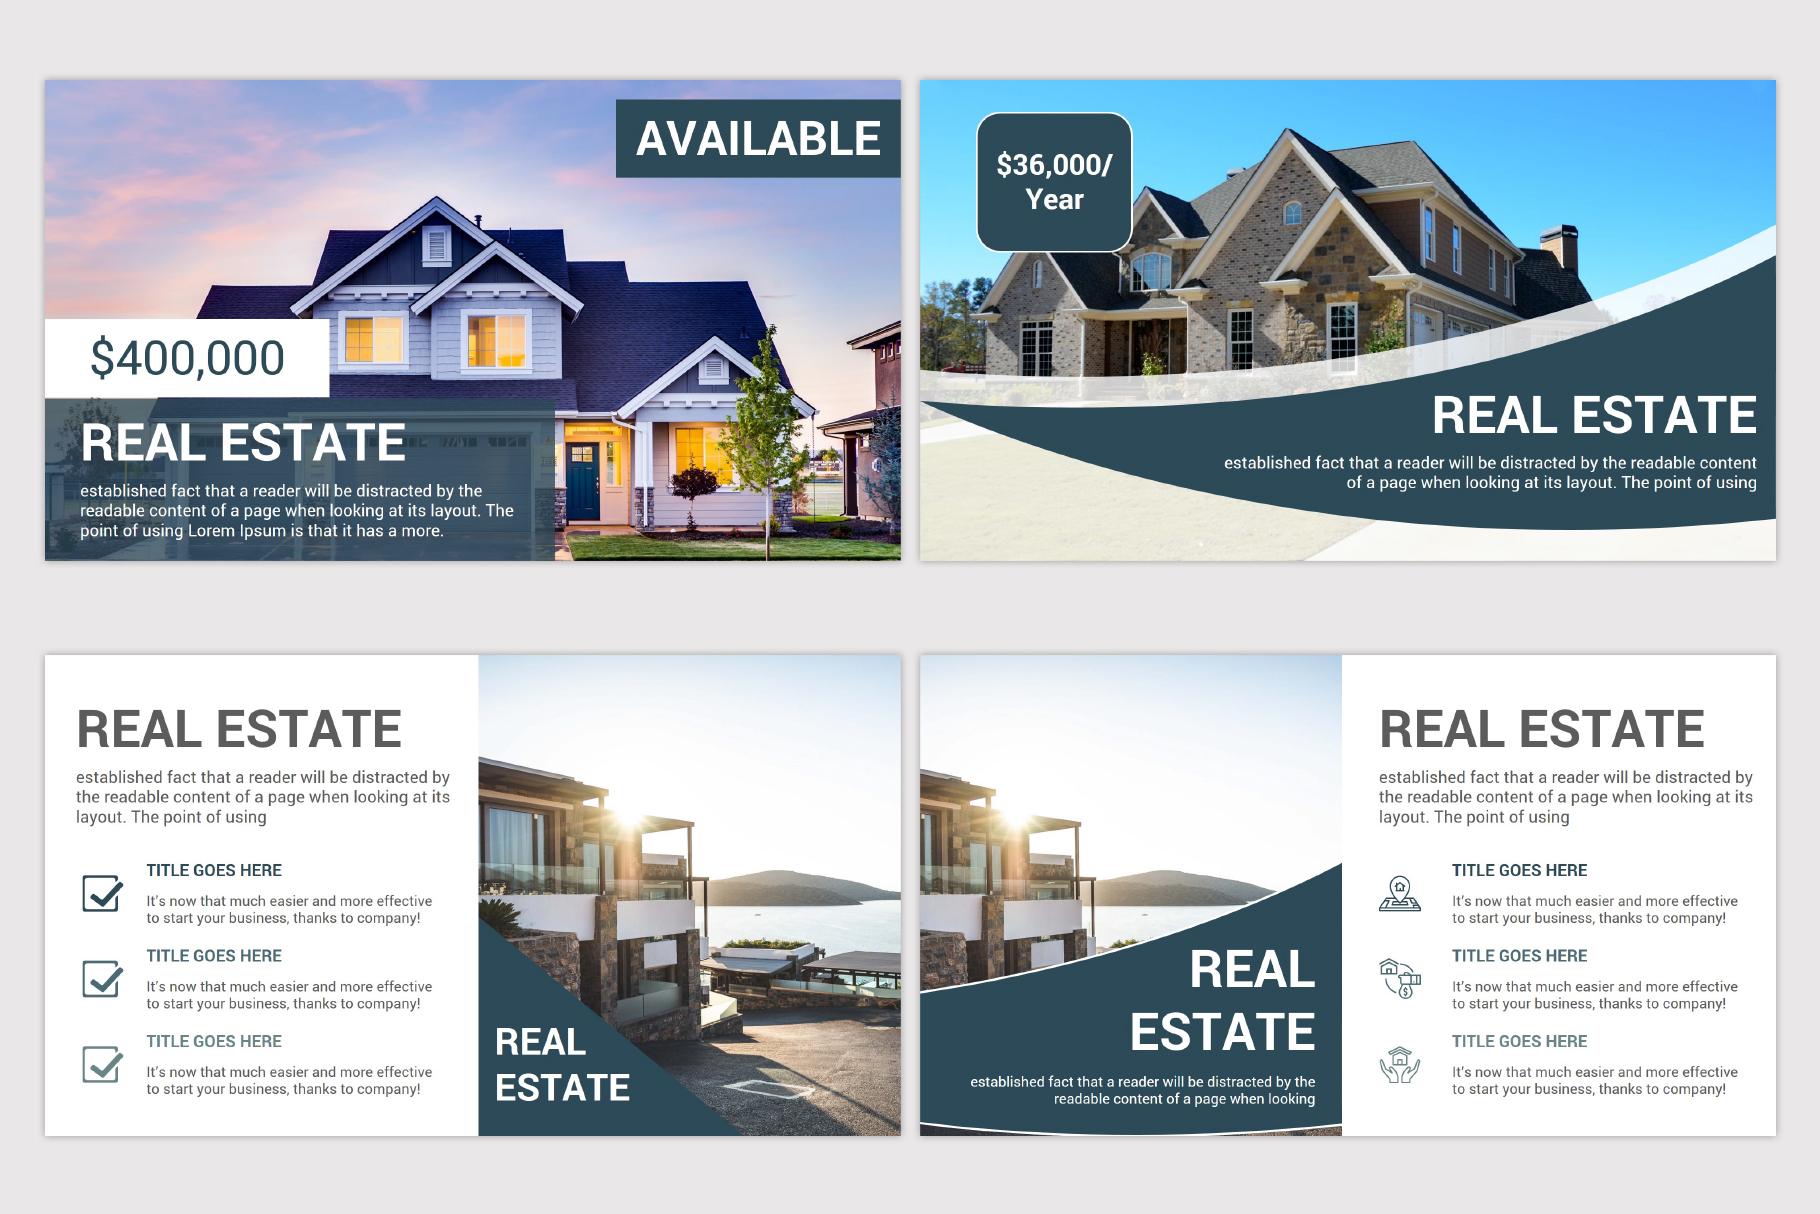 Real Estate Google Slides Template example image 5